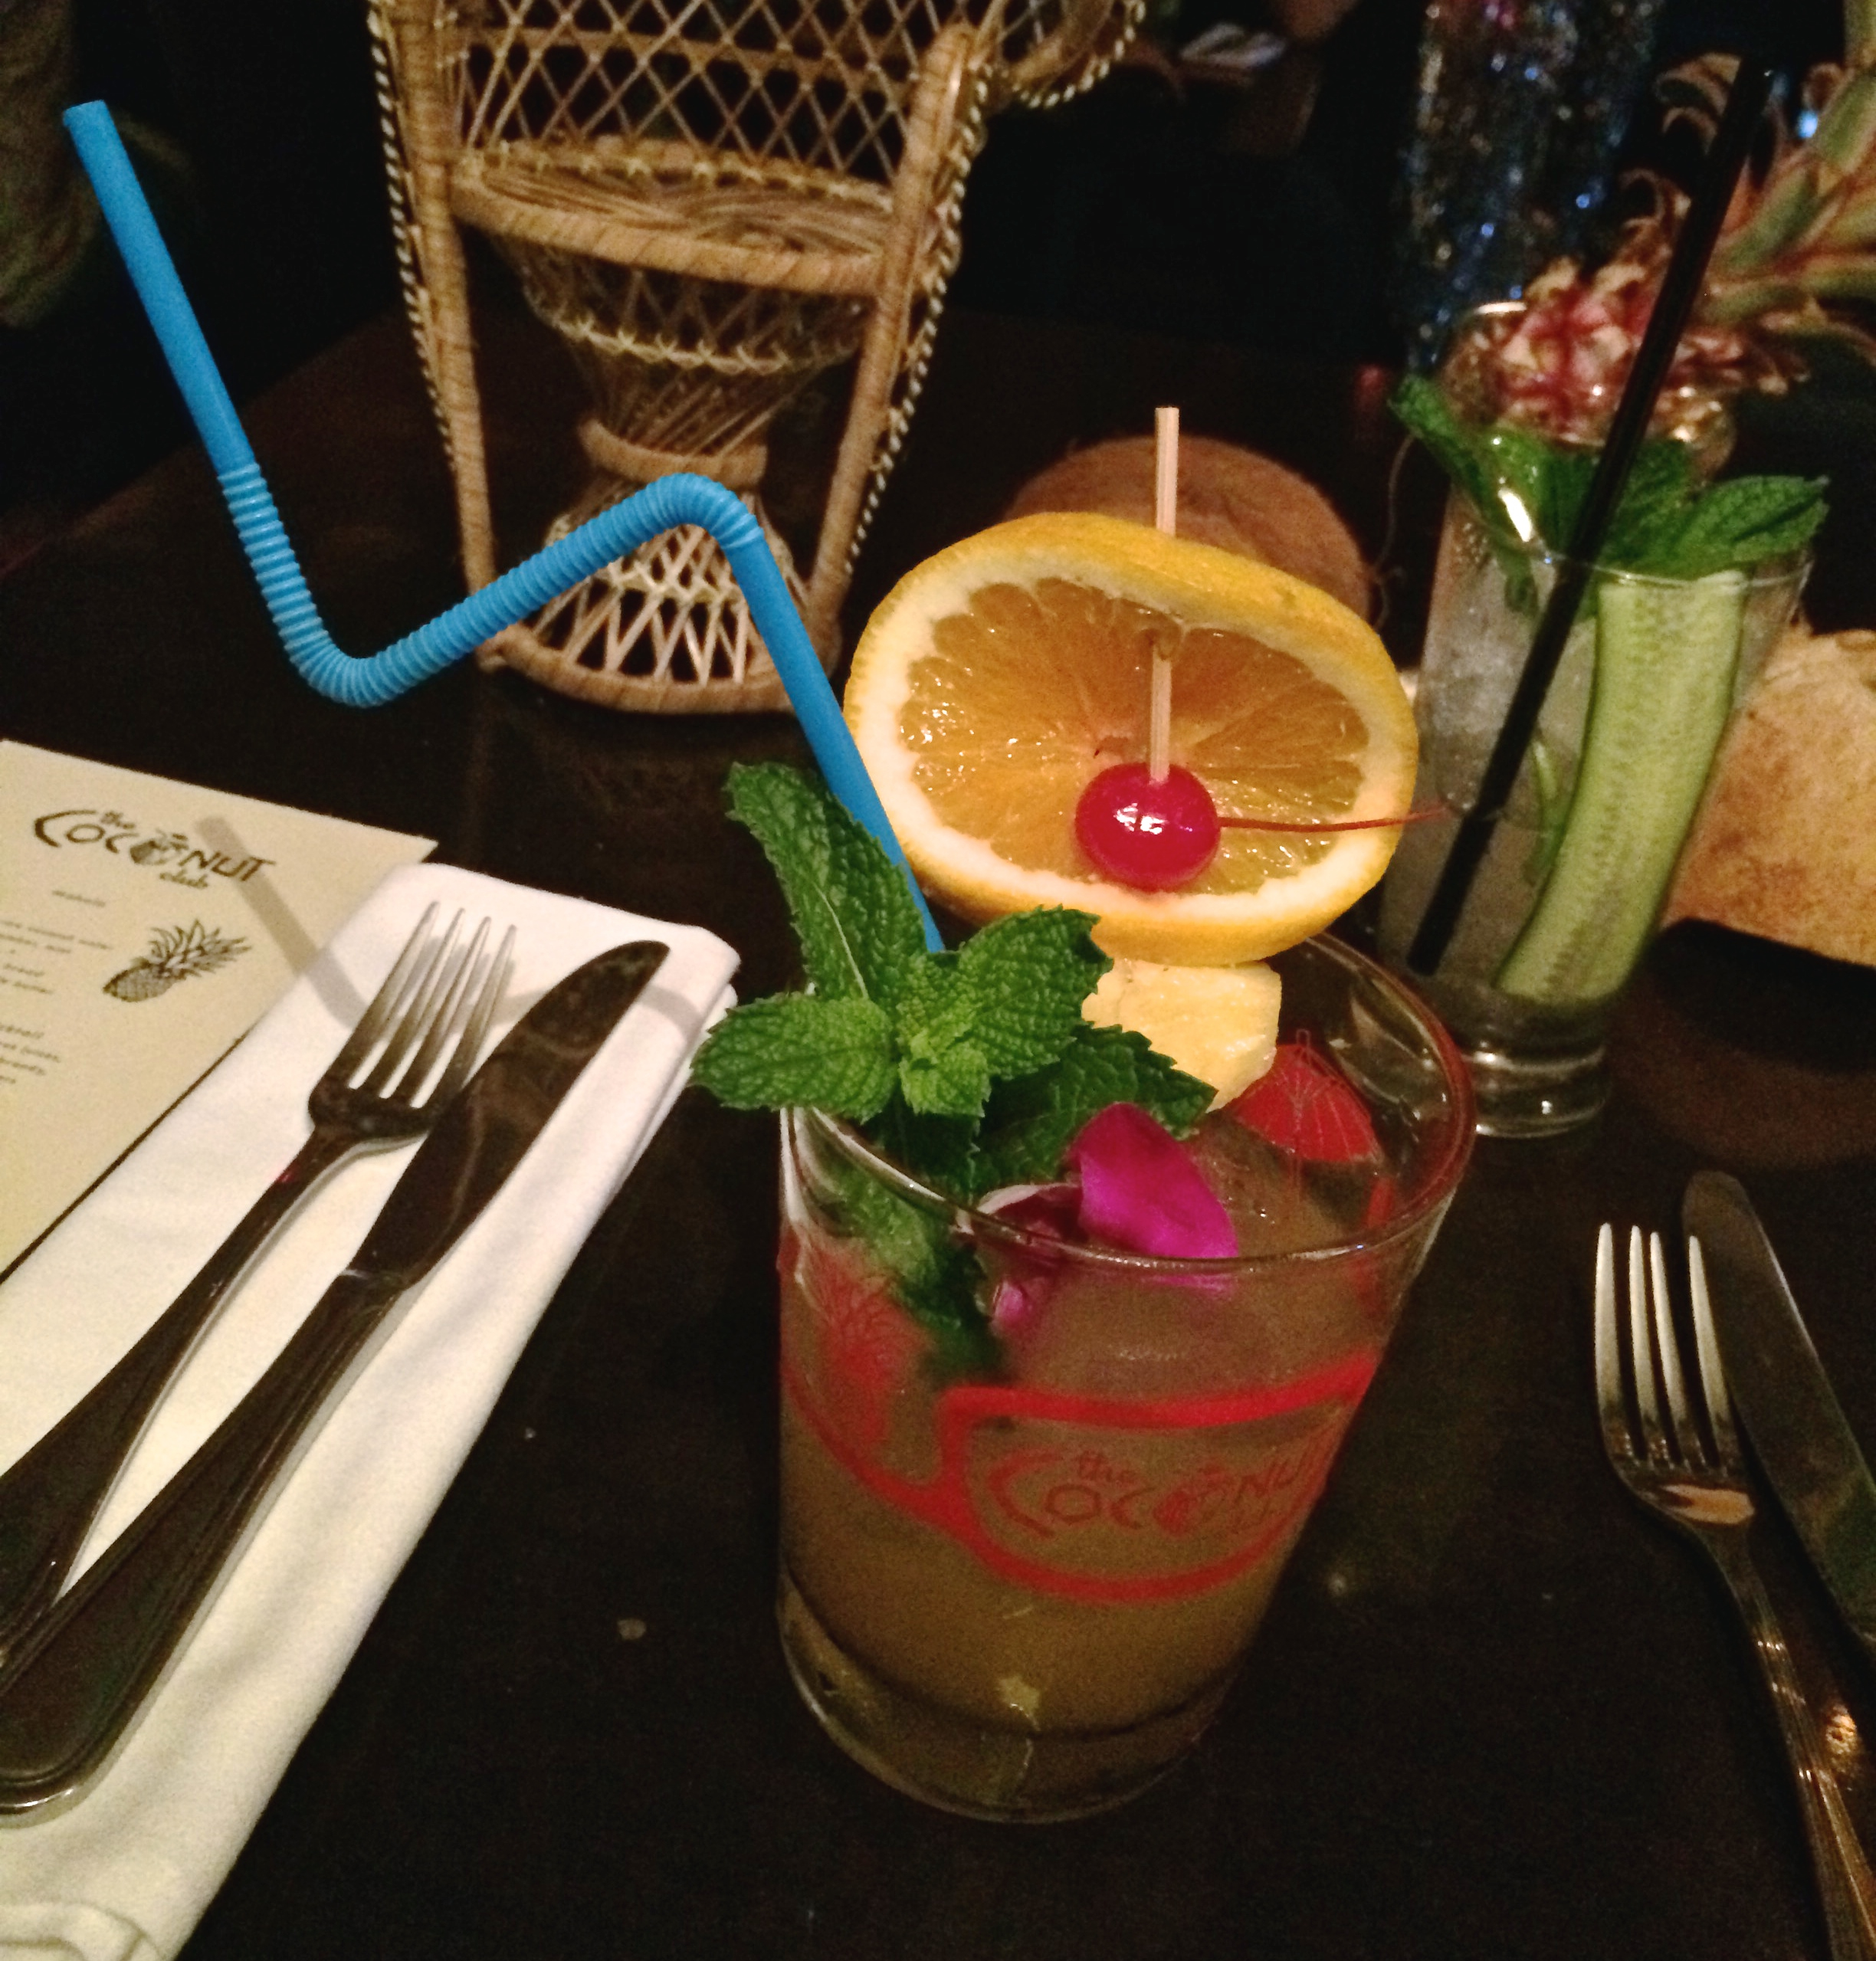 coconut-club-cocktail-glass.jpg